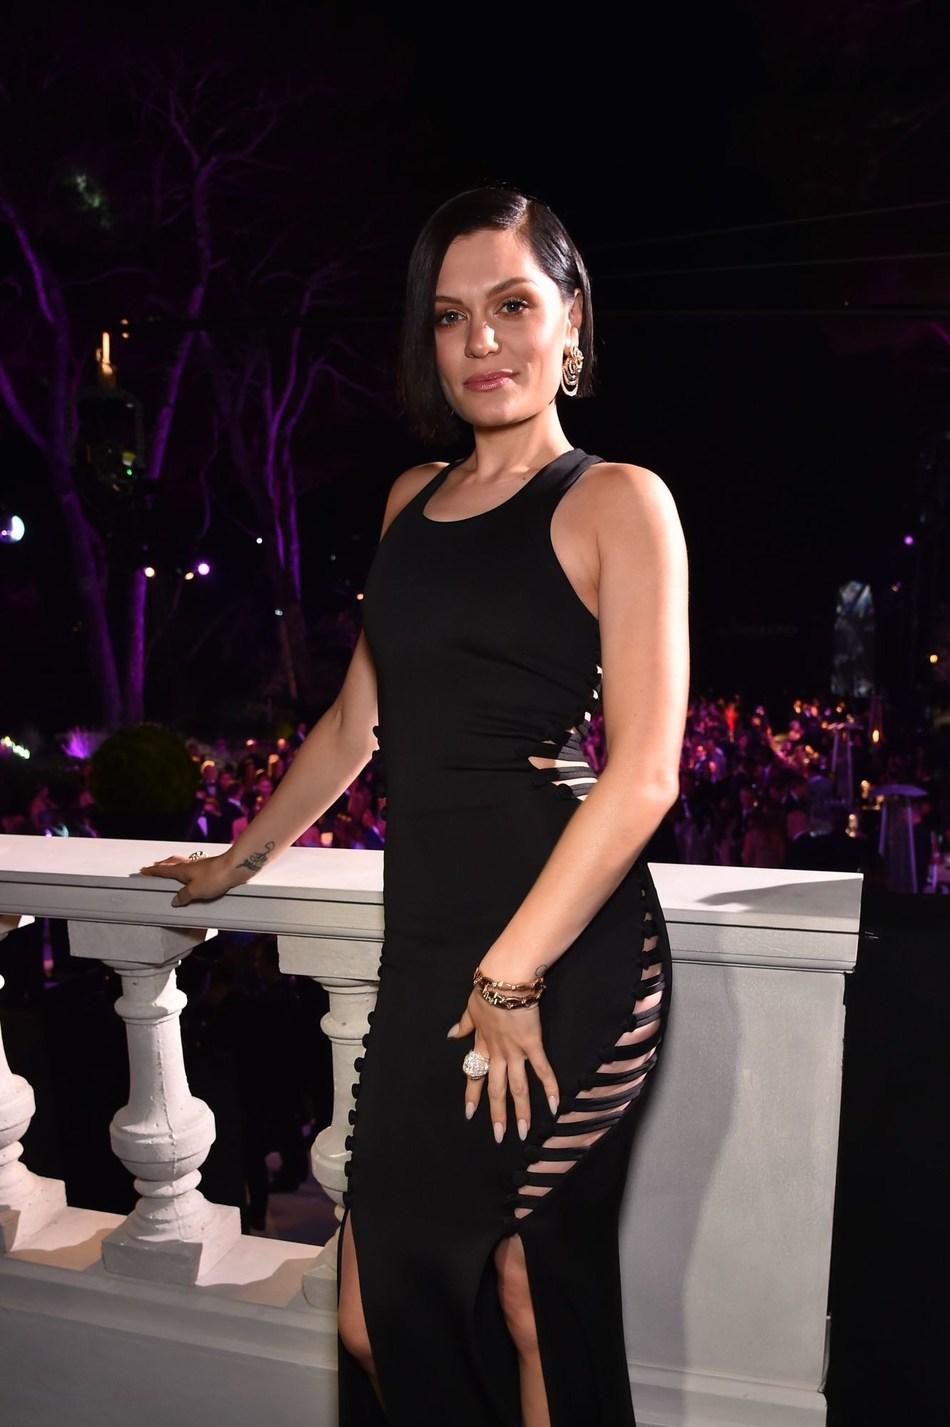 de GRISOGONO Cannes 2017 Jessie J (PRNewsfoto/de GRISOGONO)